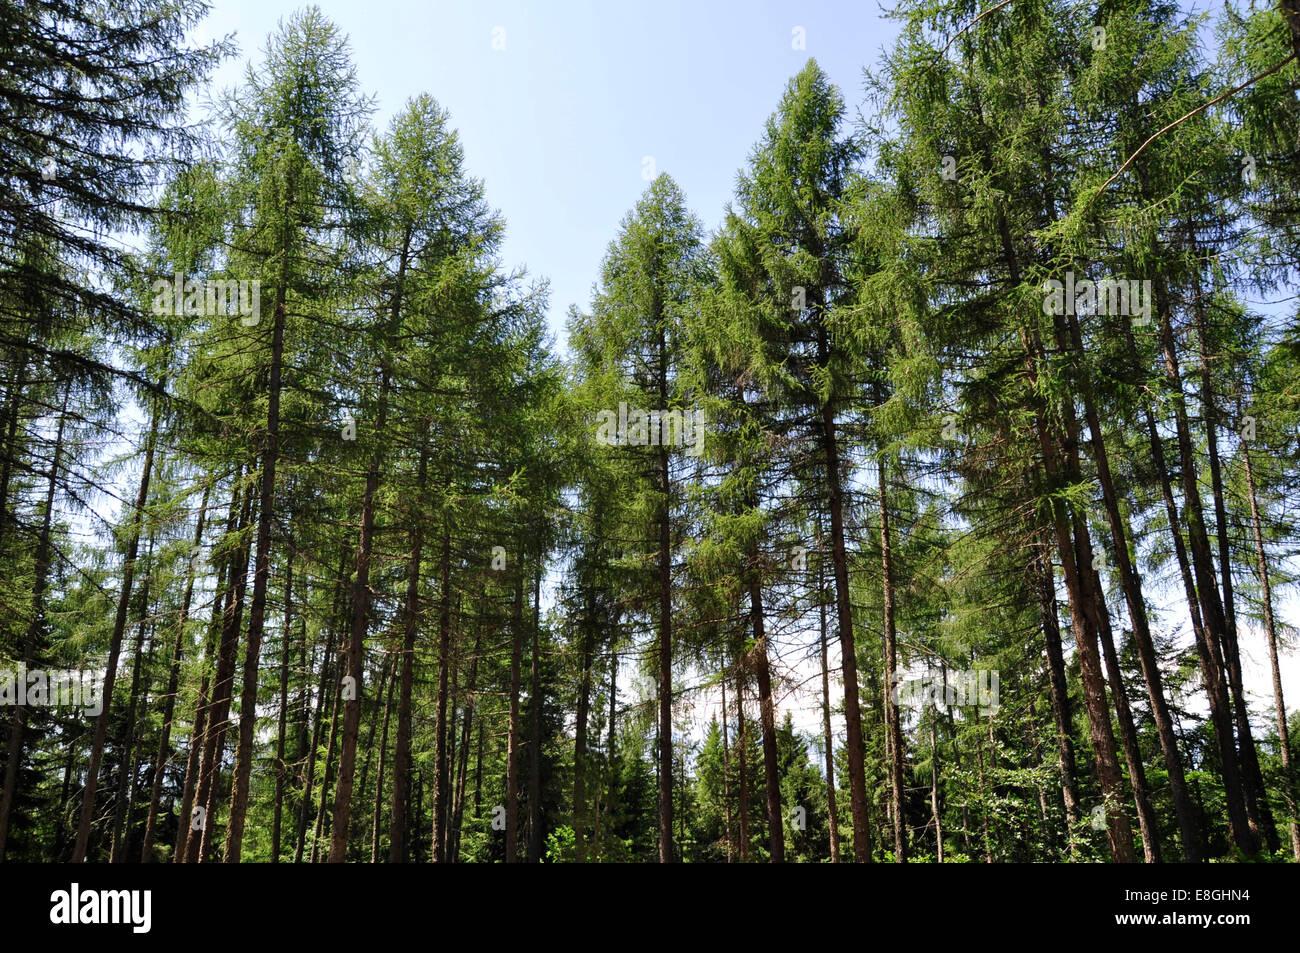 Italy, Balsegna di Pina, Pine tree forest Stock Photo